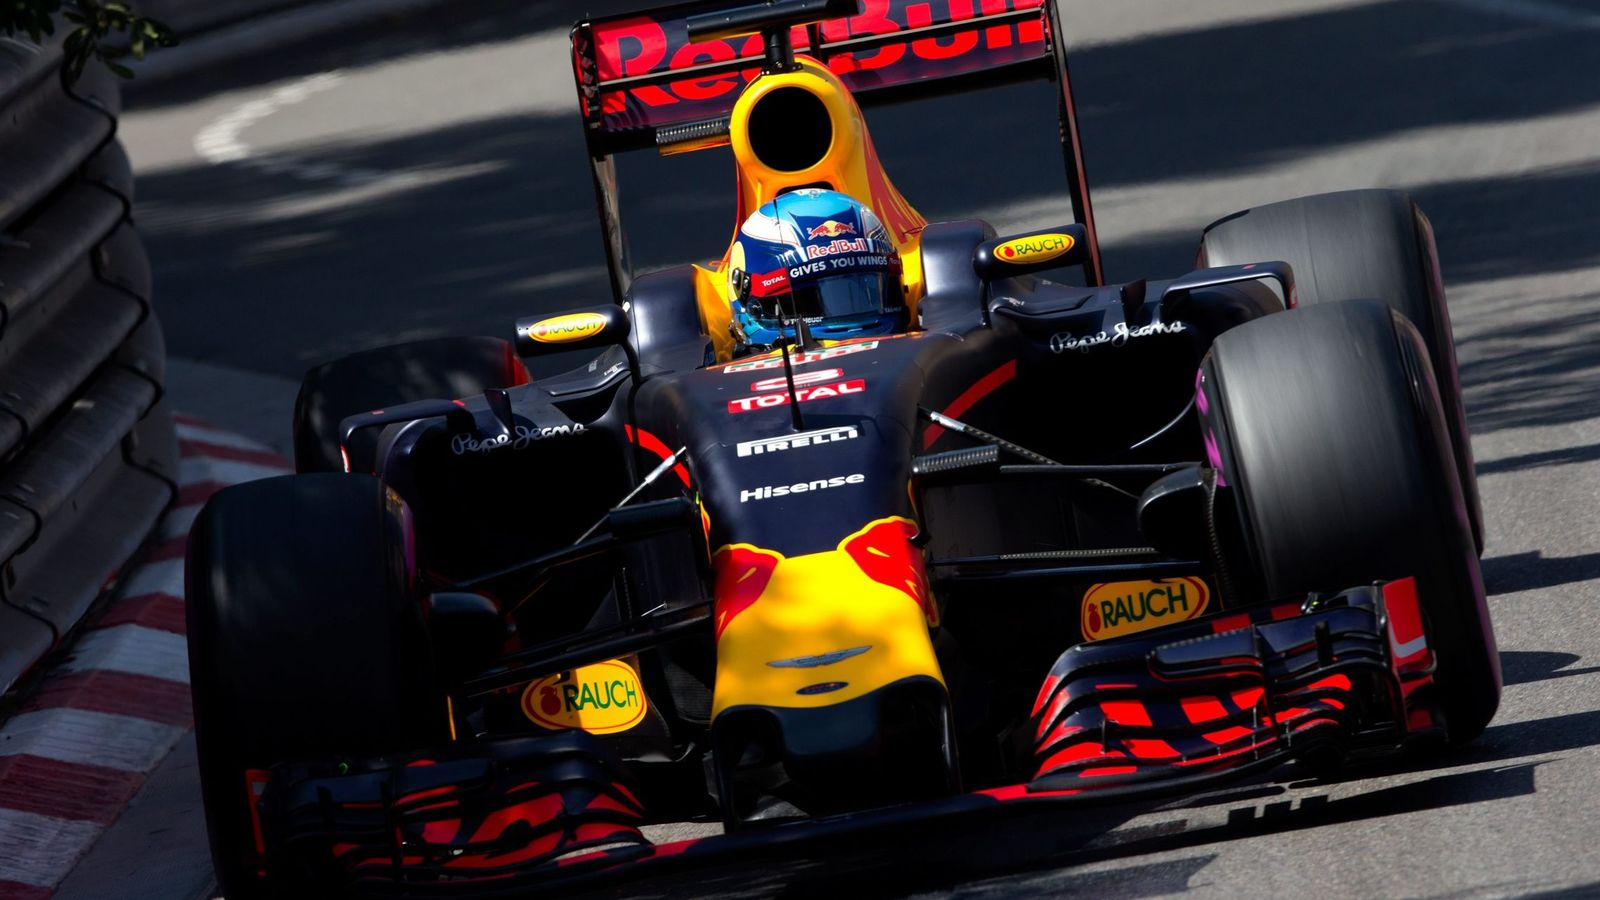 Foto: Daniel Ricciardo, este sábado, sobre el asfalto de Mónaco.